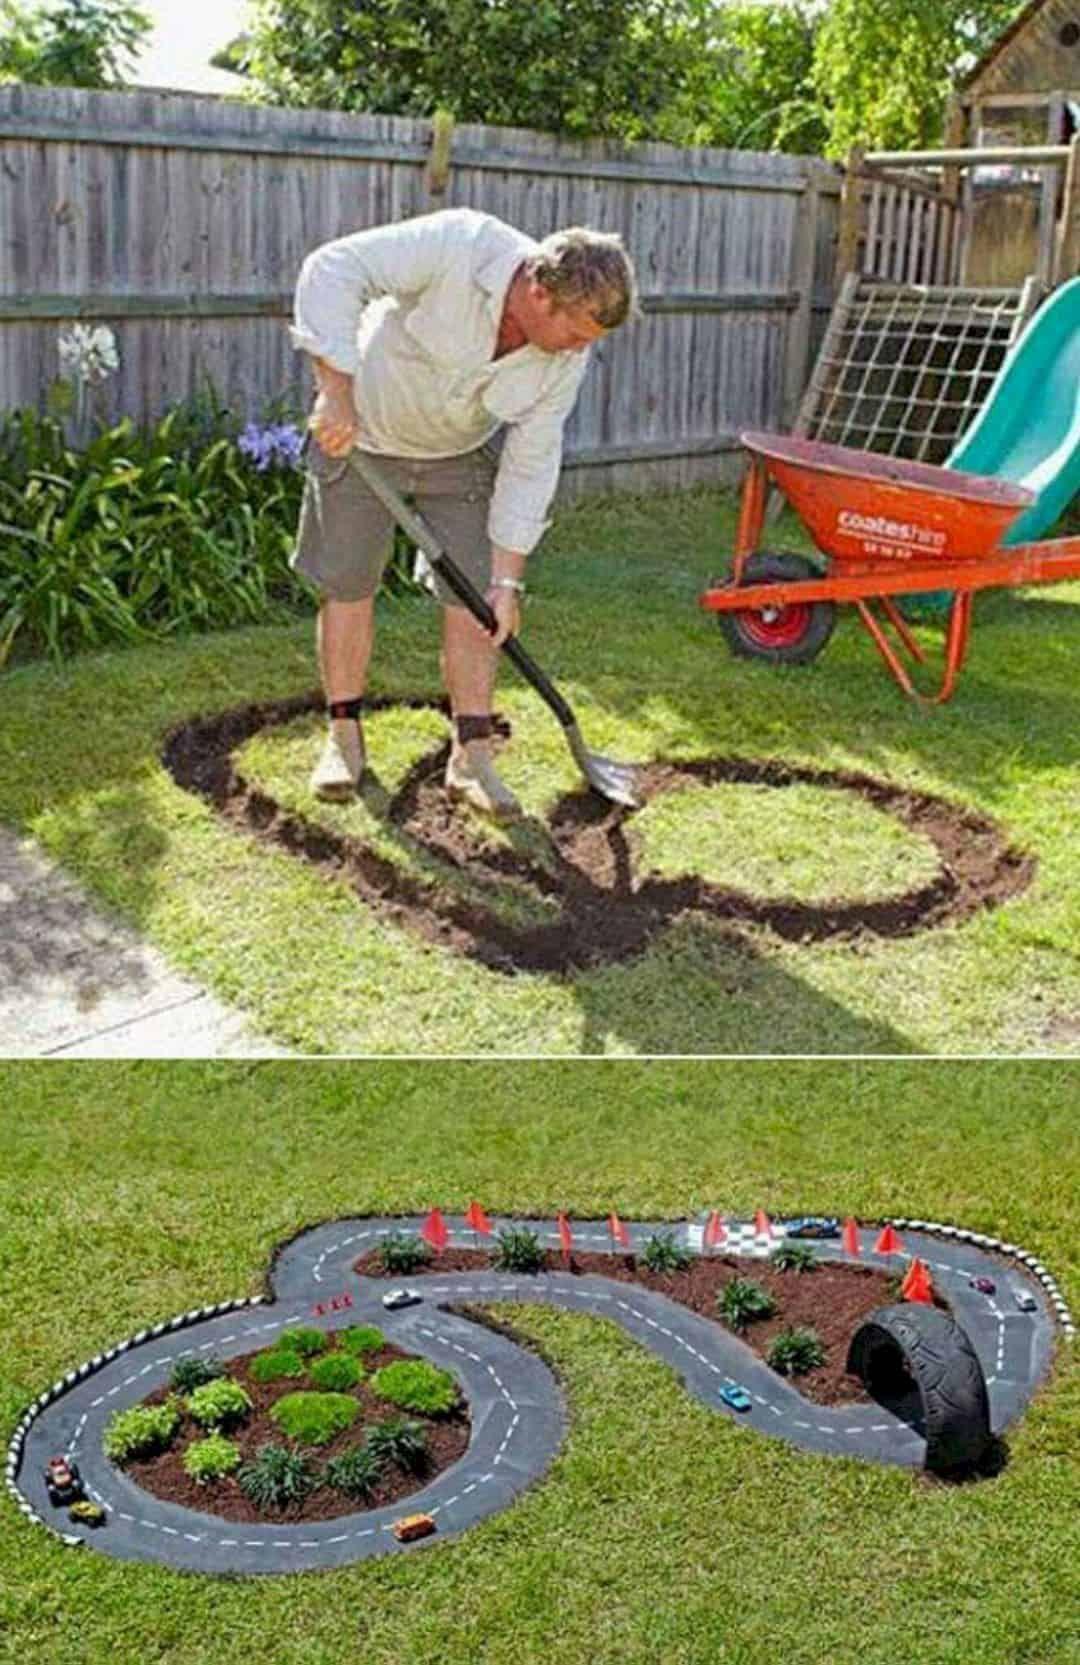 Nice Diy Kids Playground Ideas For Backyard 46 Backyard For Kids Diy Projects For Kids Outdoor Kids